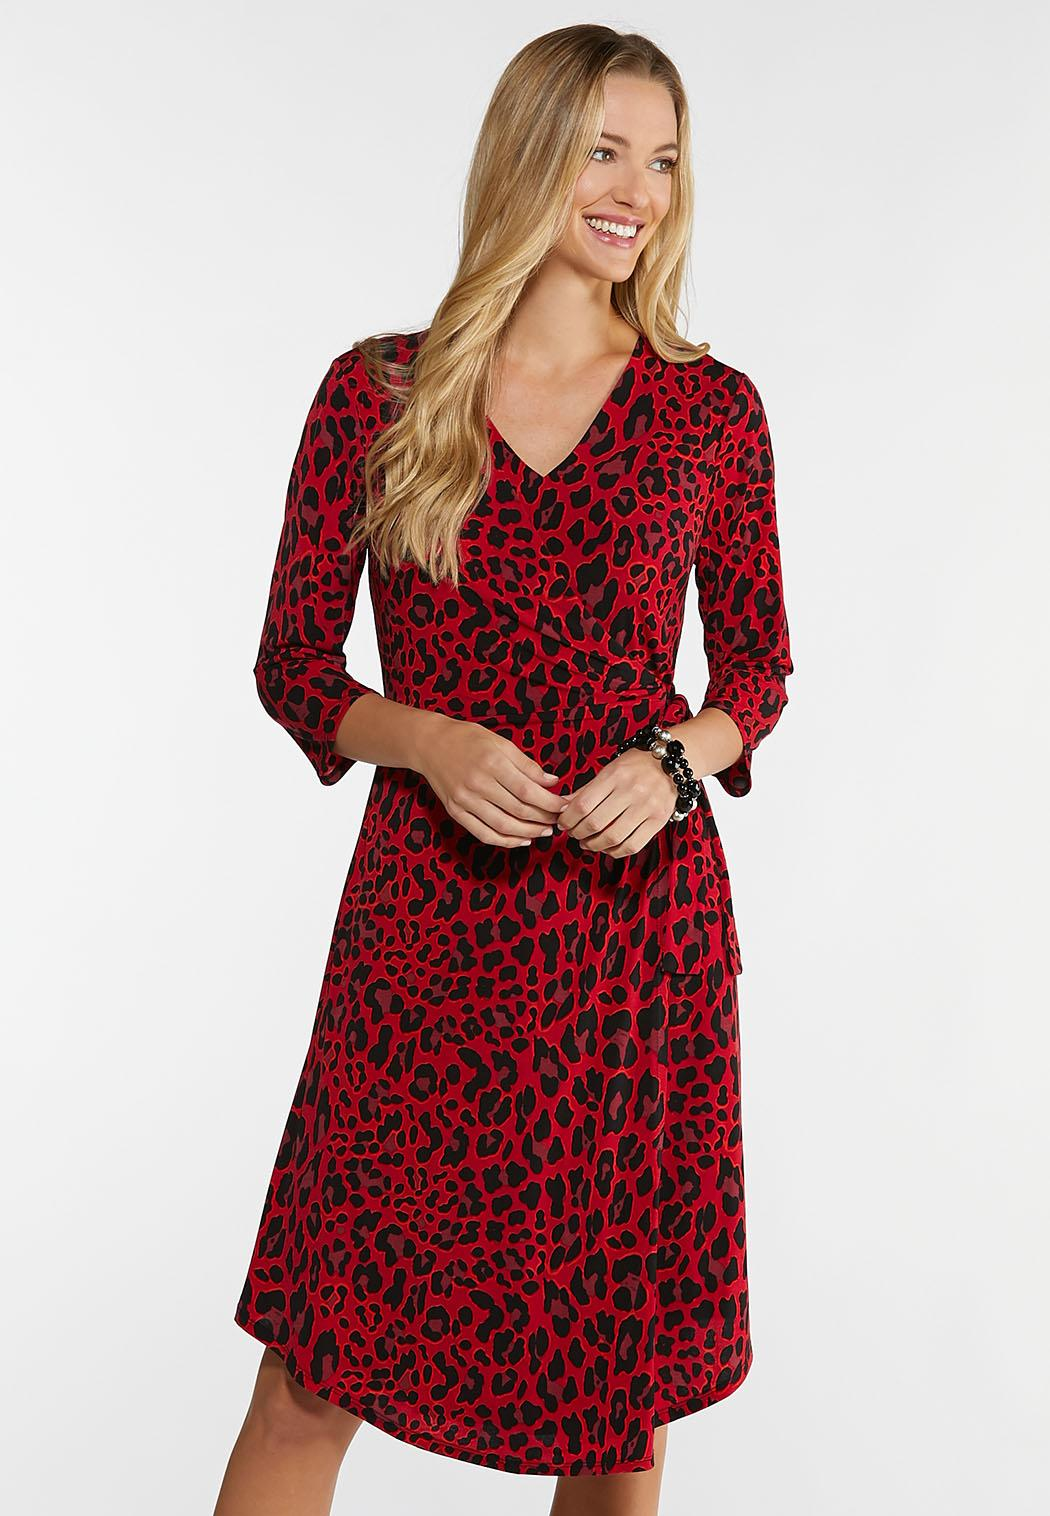 Plus Size Red Leopard Dress Plus Sizes Cato Fashions